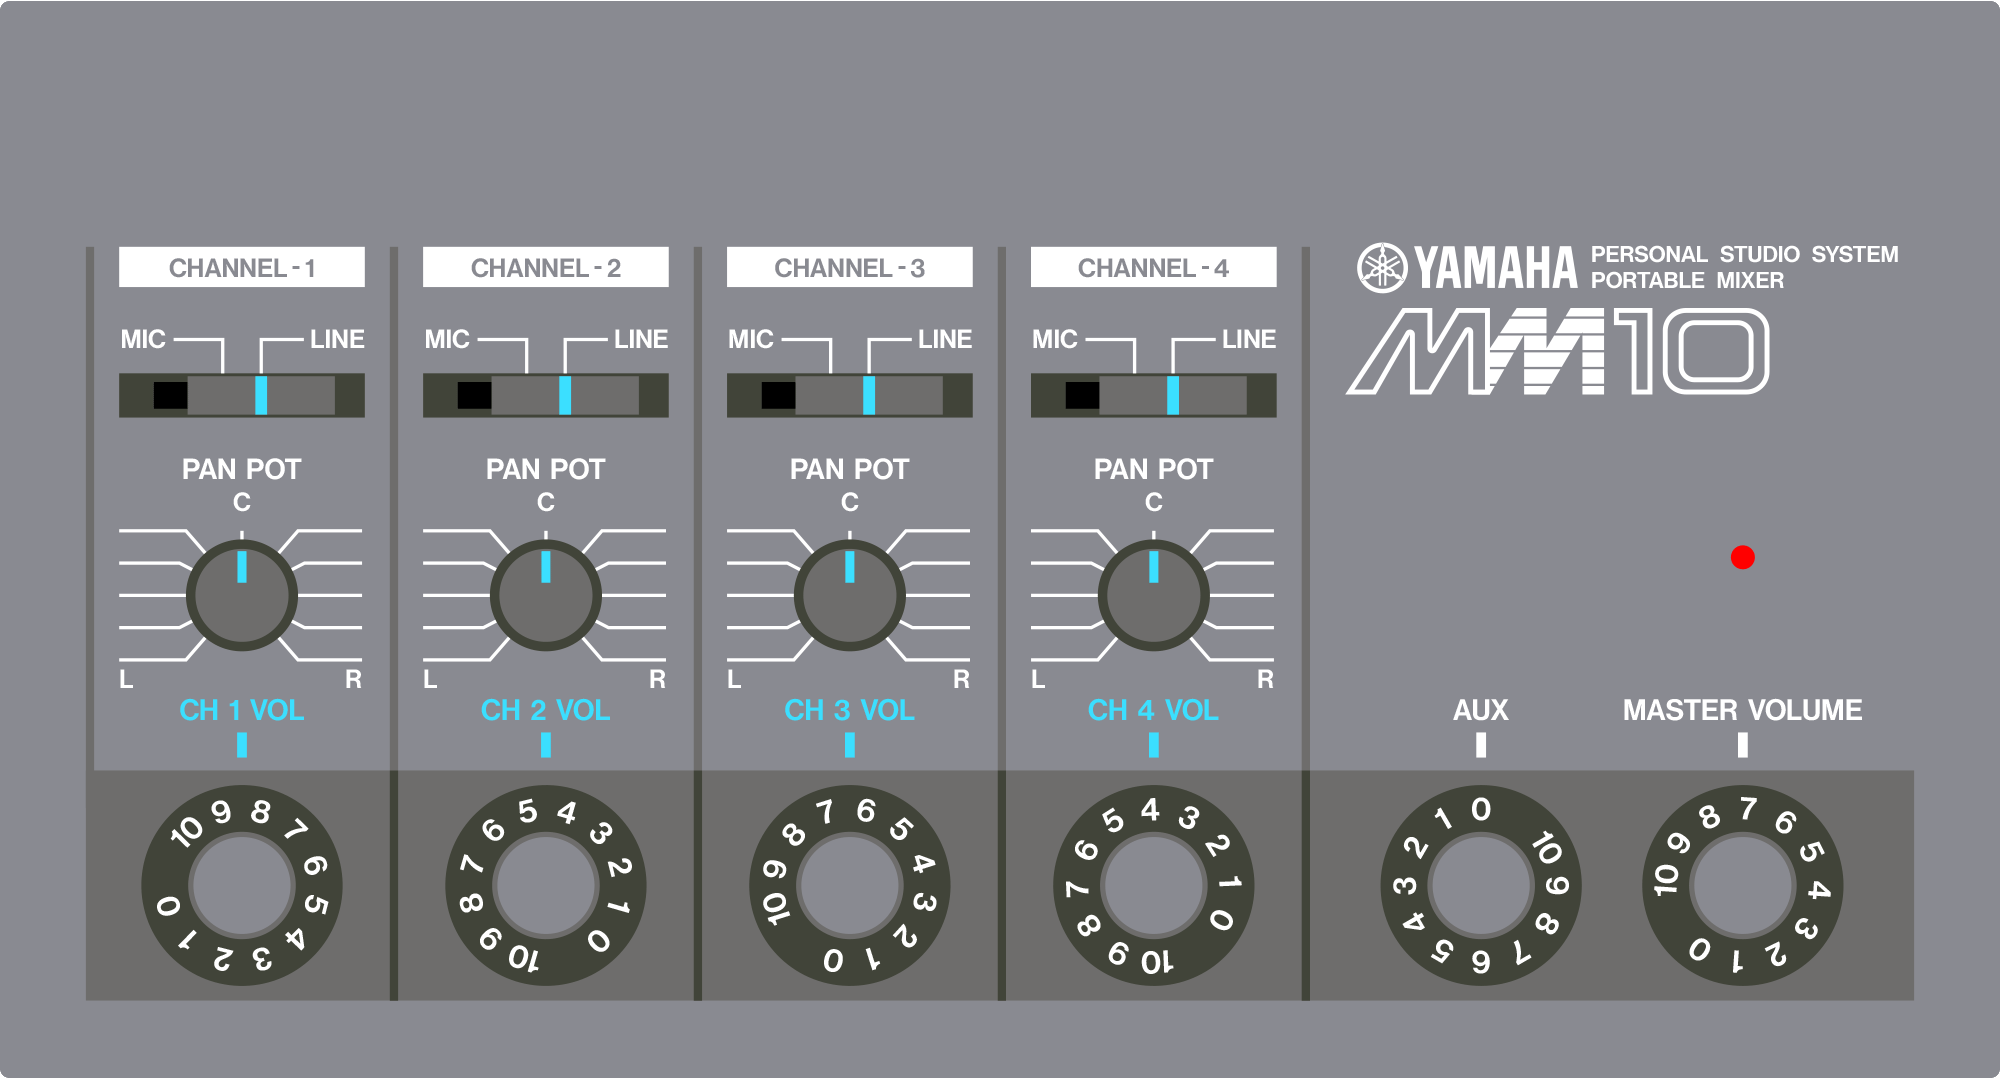 Yamaha MM10 portable mixer